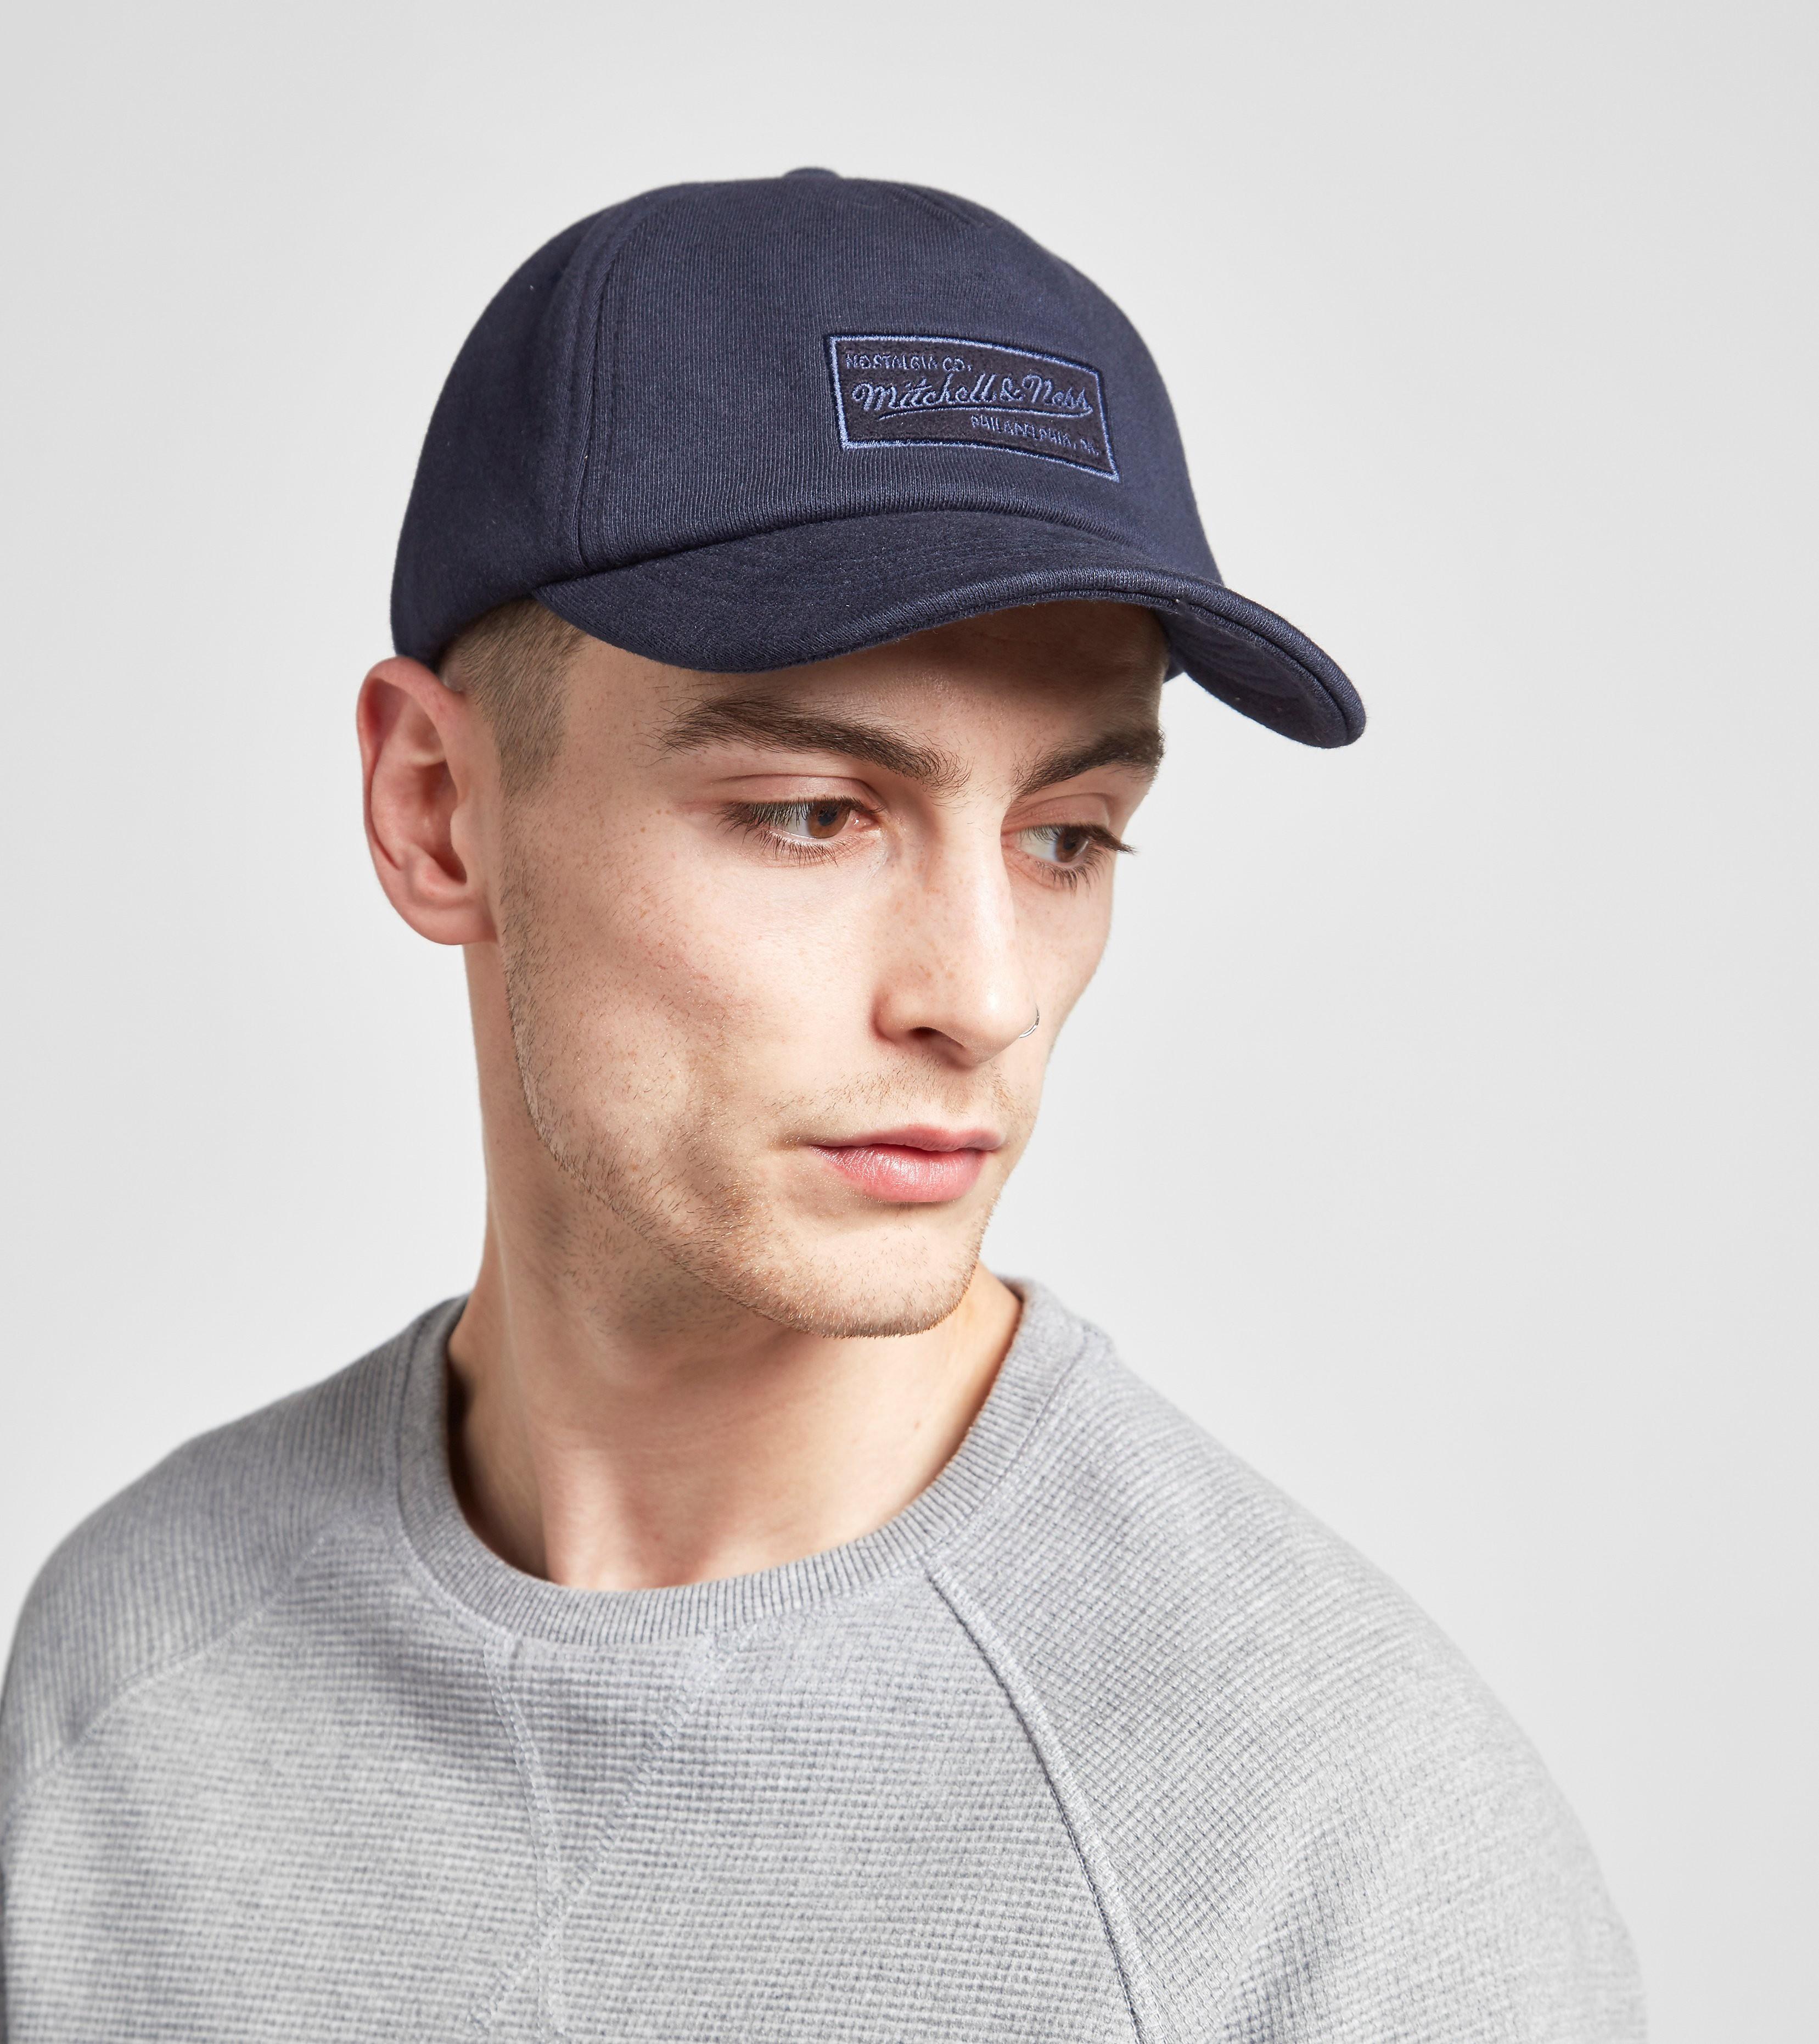 Mitchell & Ness Snapback Stitched Cap